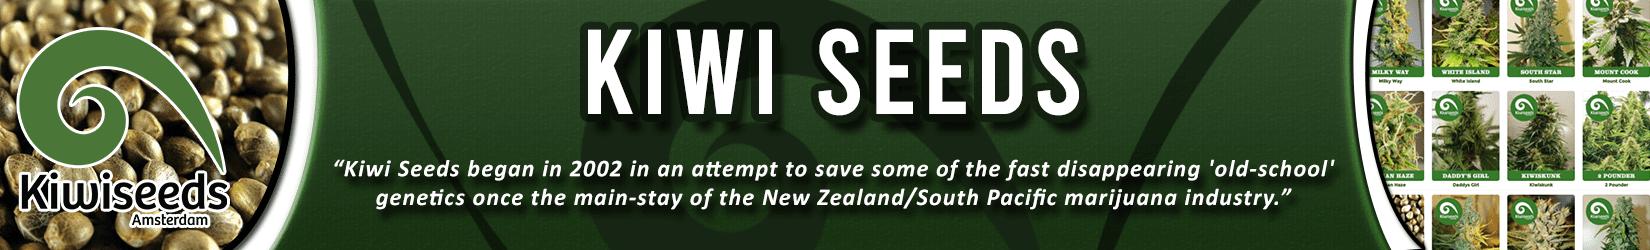 Cannabis Seeds Breeder - Kiwi Seeds